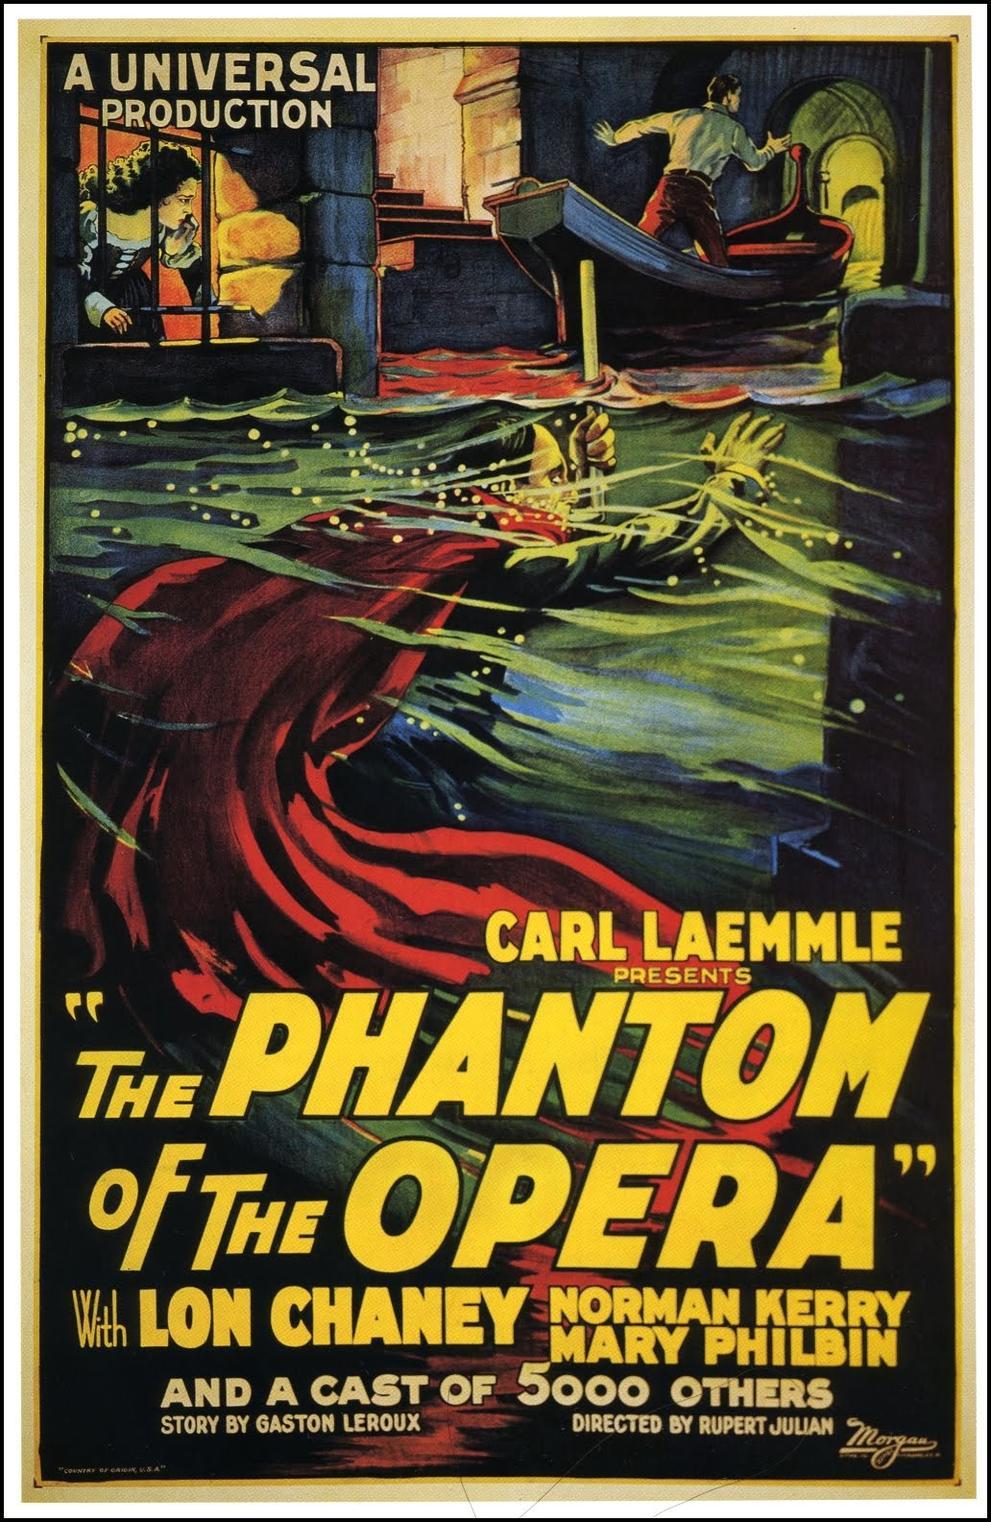 20140821145410!The_Phantom_of_the_Opera_(1925_film).jpg